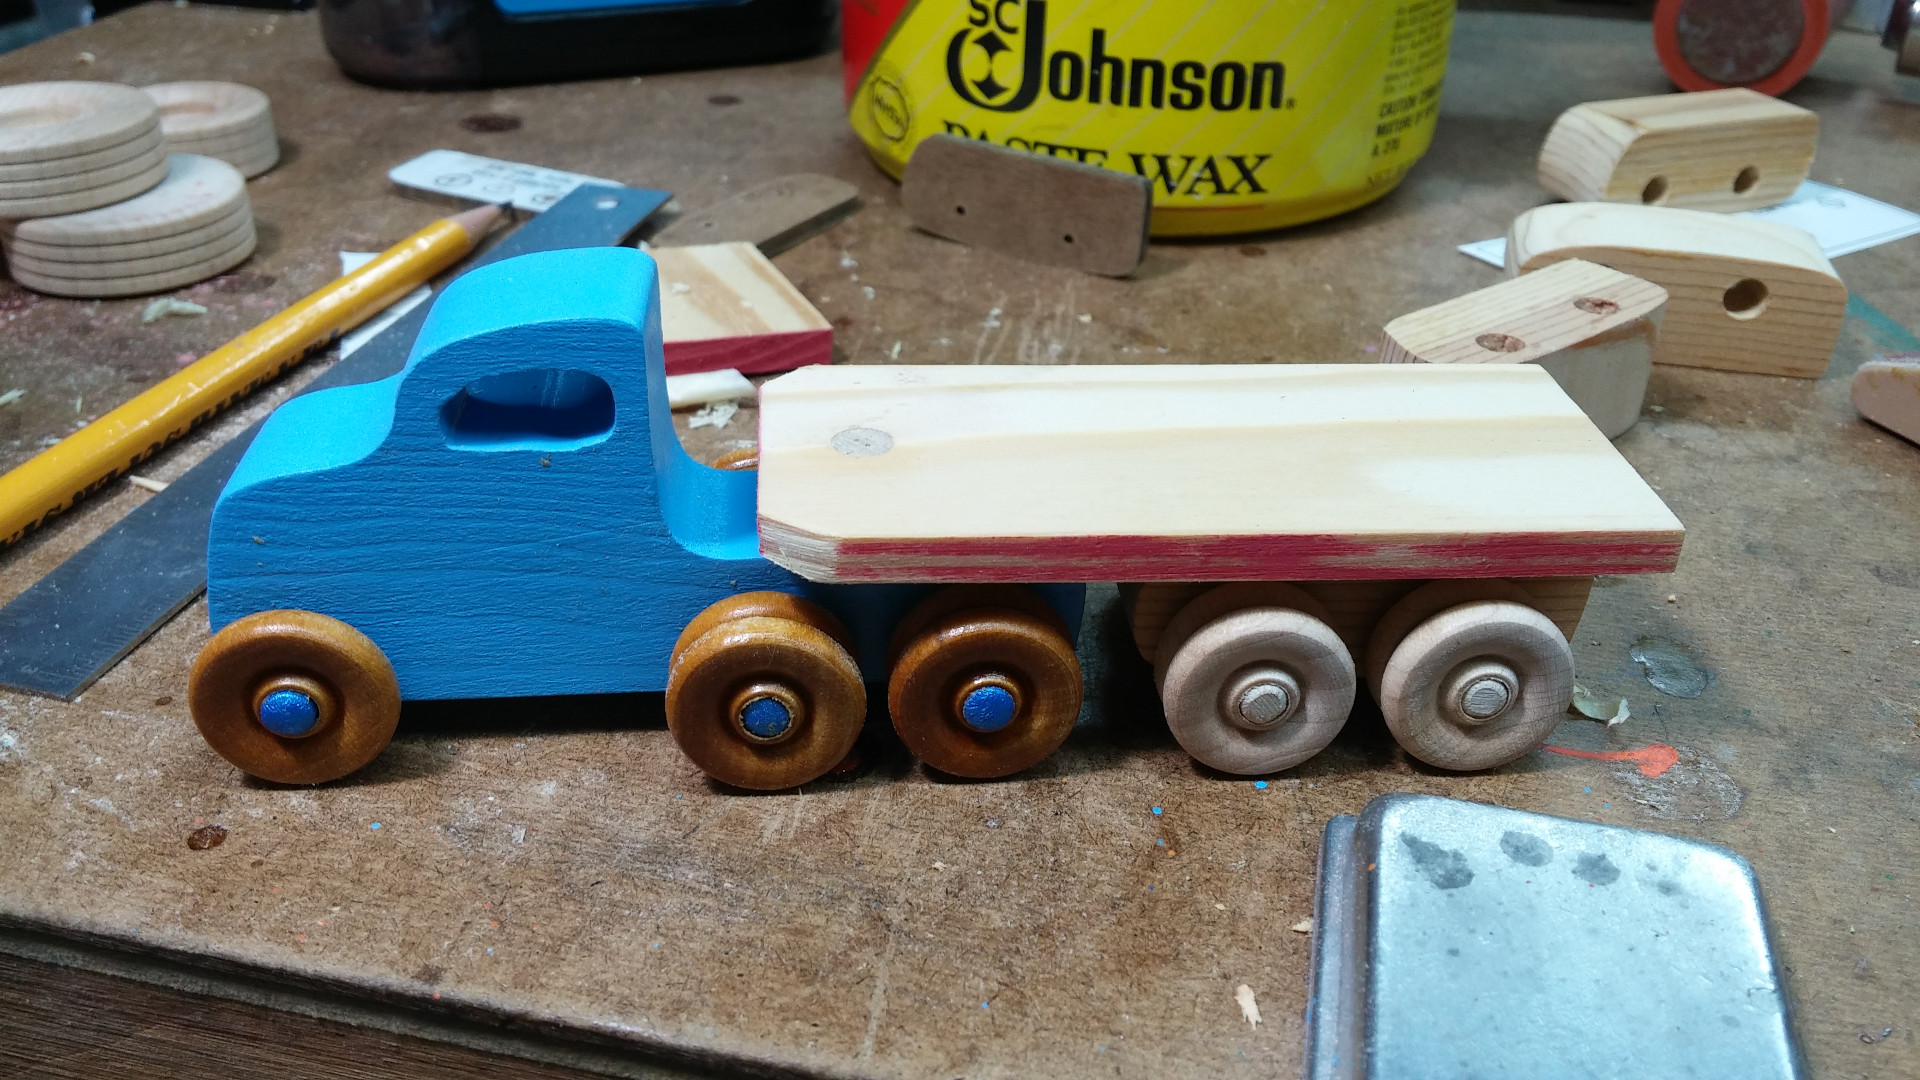 2017-04-30 20.53.22-handmade-play-pal-blue-wooden-toy-truck-tractor-trailer.jpg